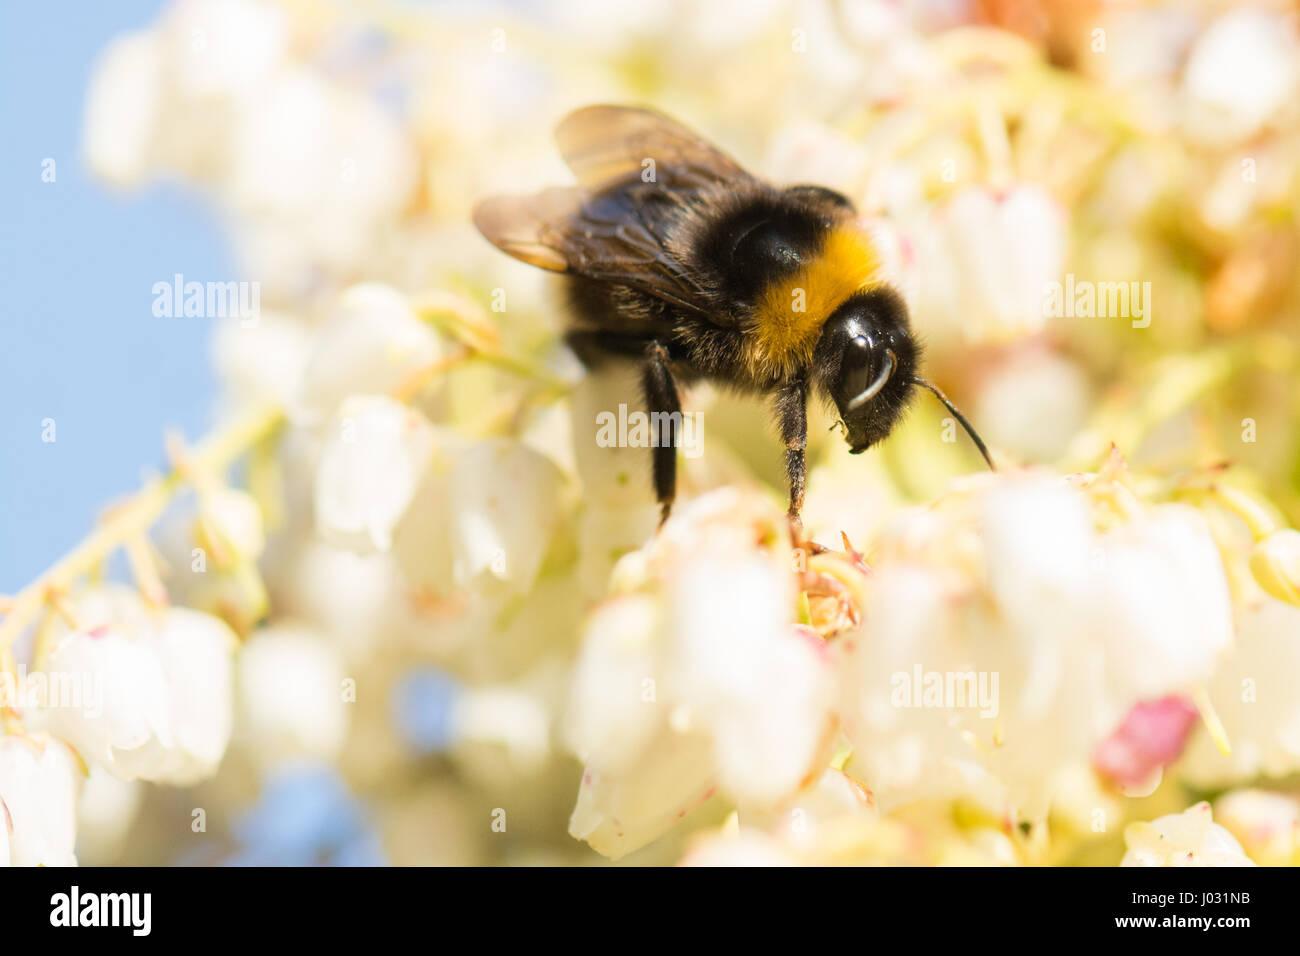 Early Spring Stockfotos & Early Spring Bilder - Alamy